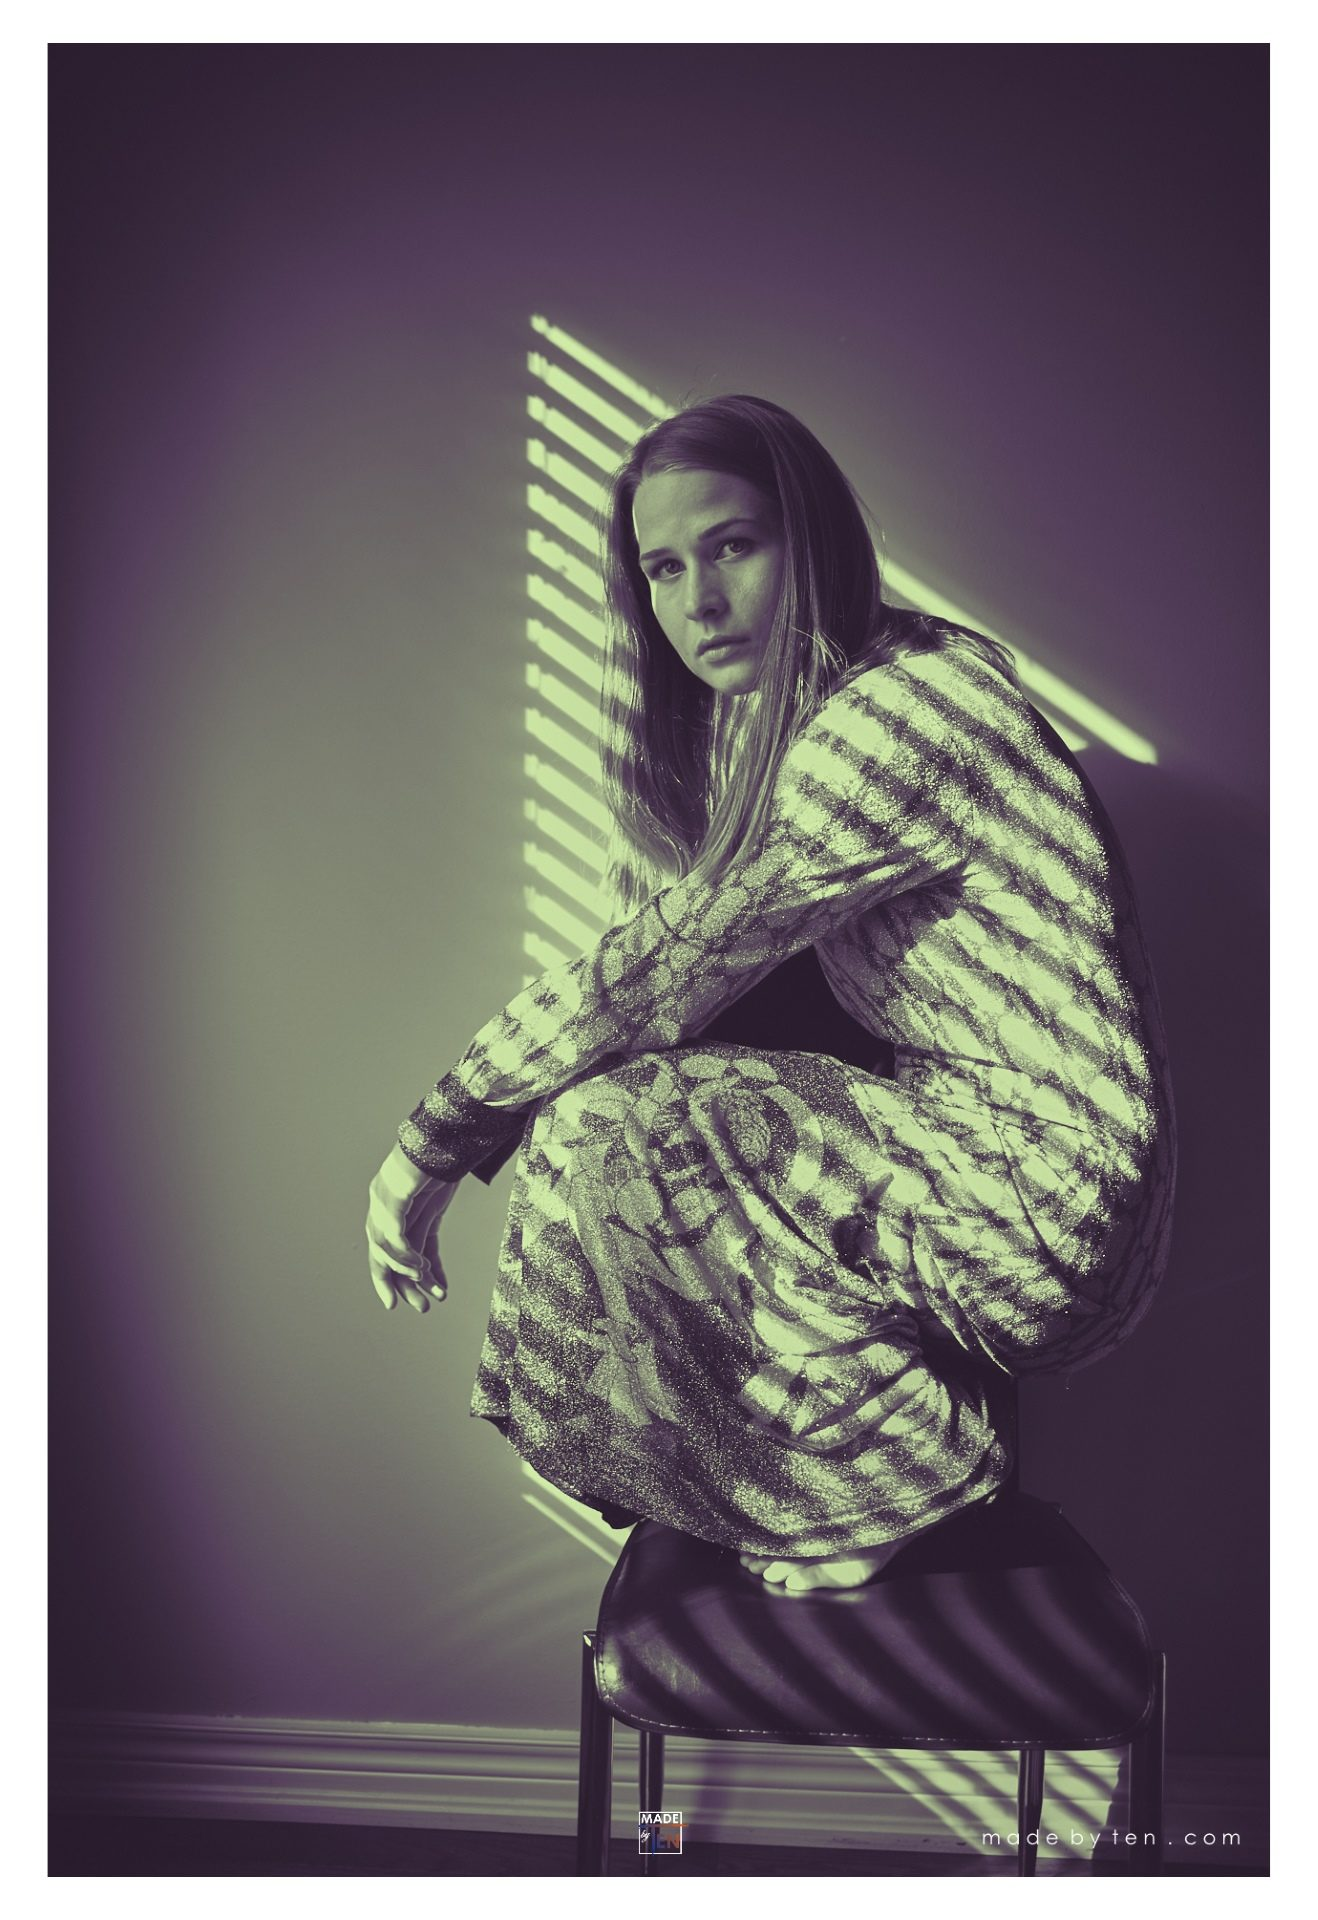 Crouching on Chair - GTA Women Art Photography